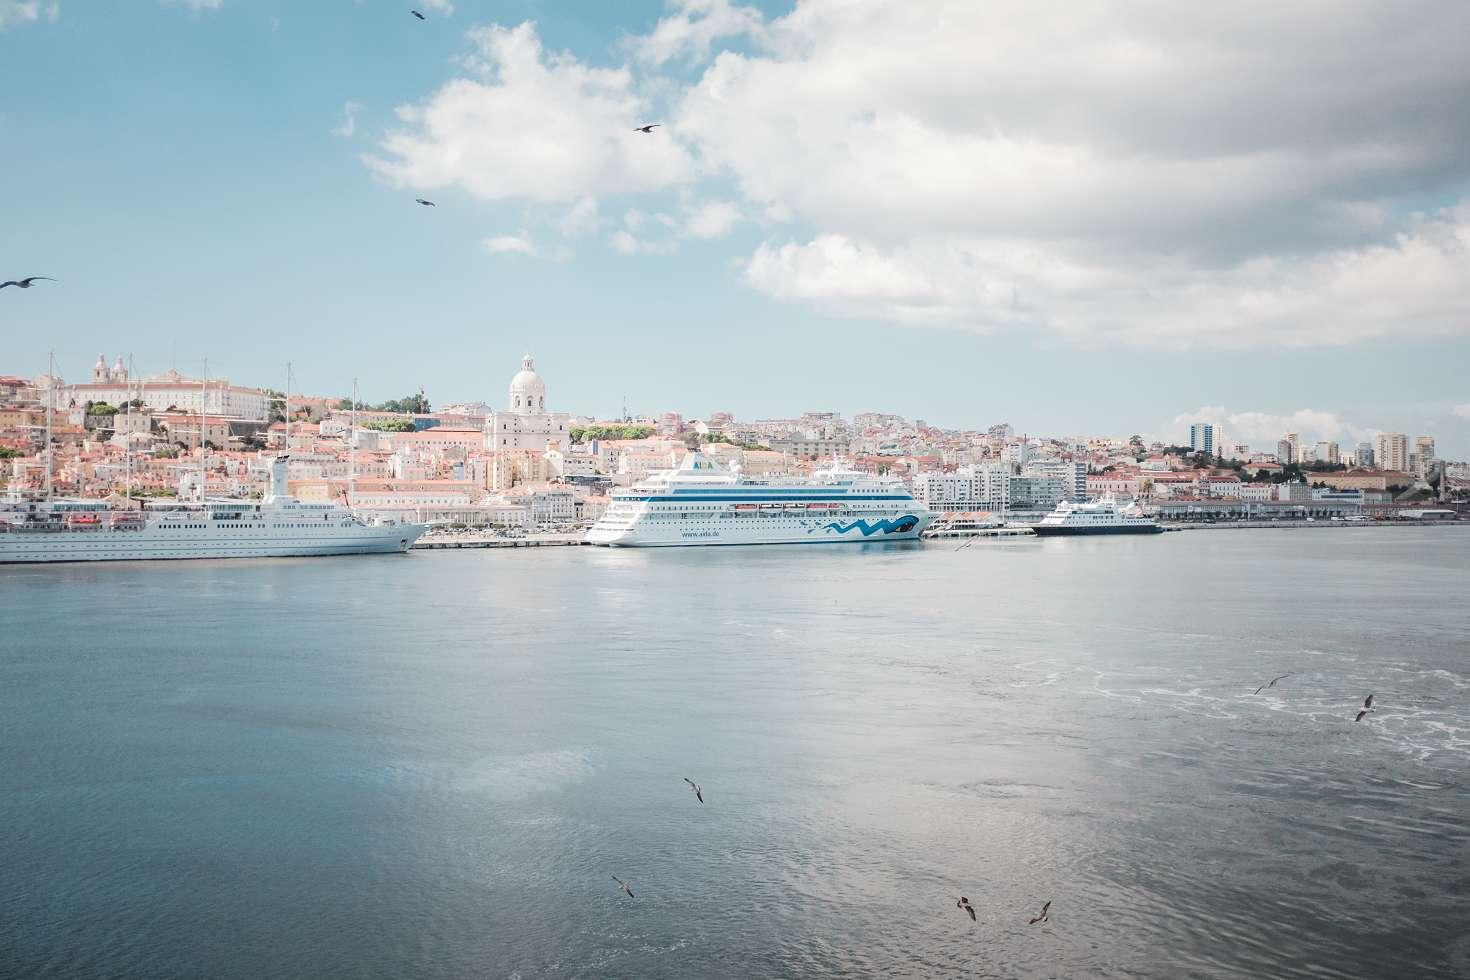 Valencia-Lissabon-Vigo-Stonehenge (48)